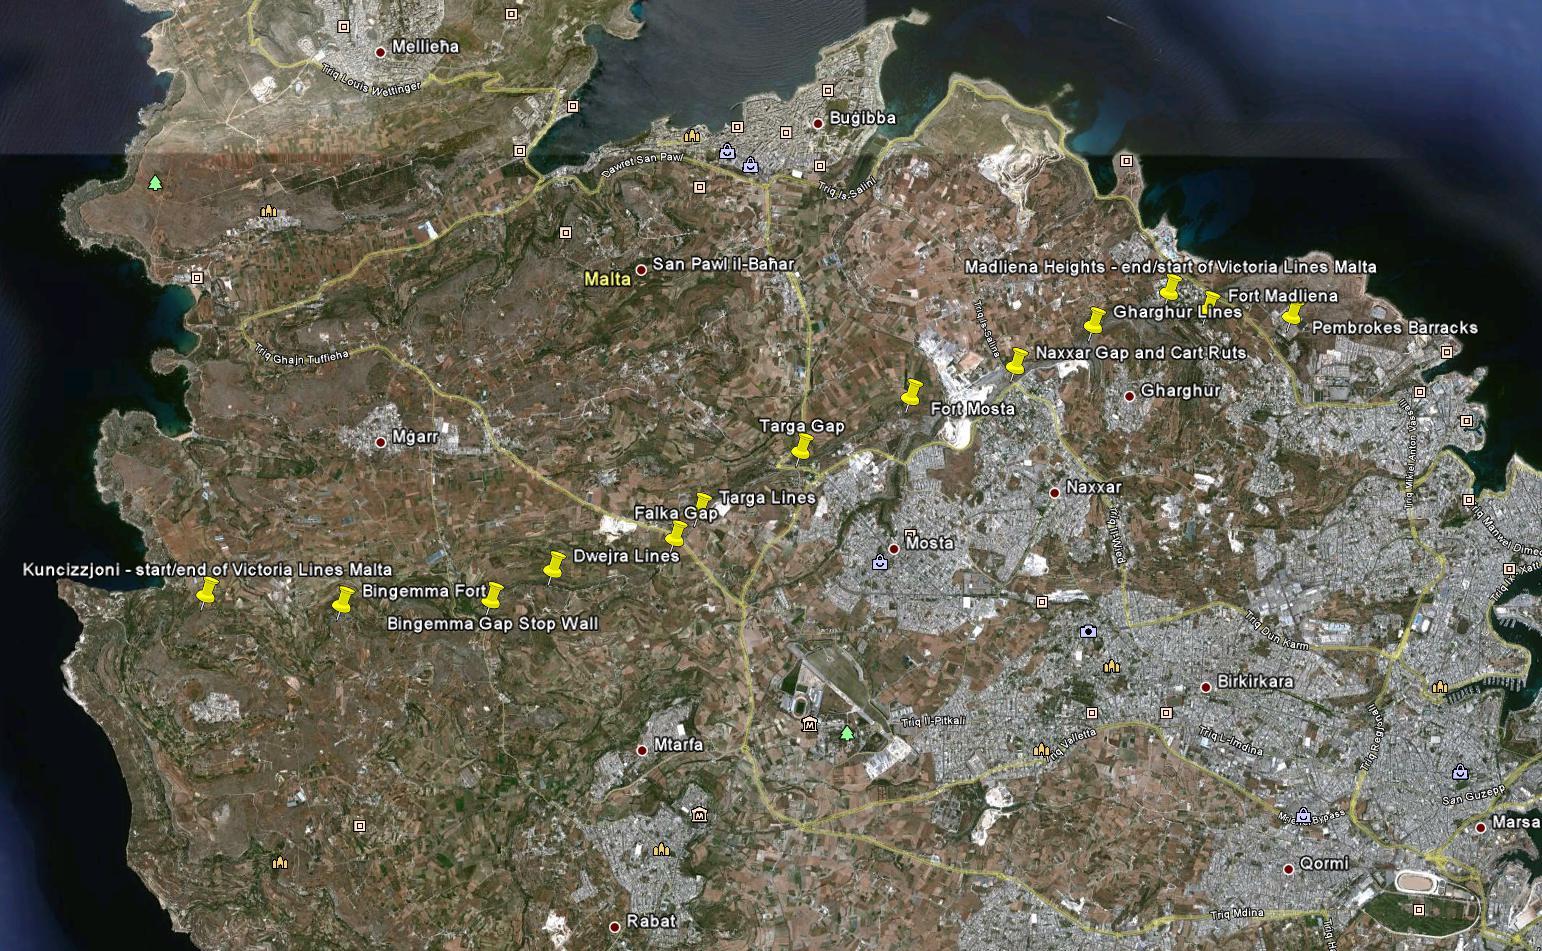 A Victoria Lines teljes hossza nyugatról keletre Forrás: Victoria Lines Malta